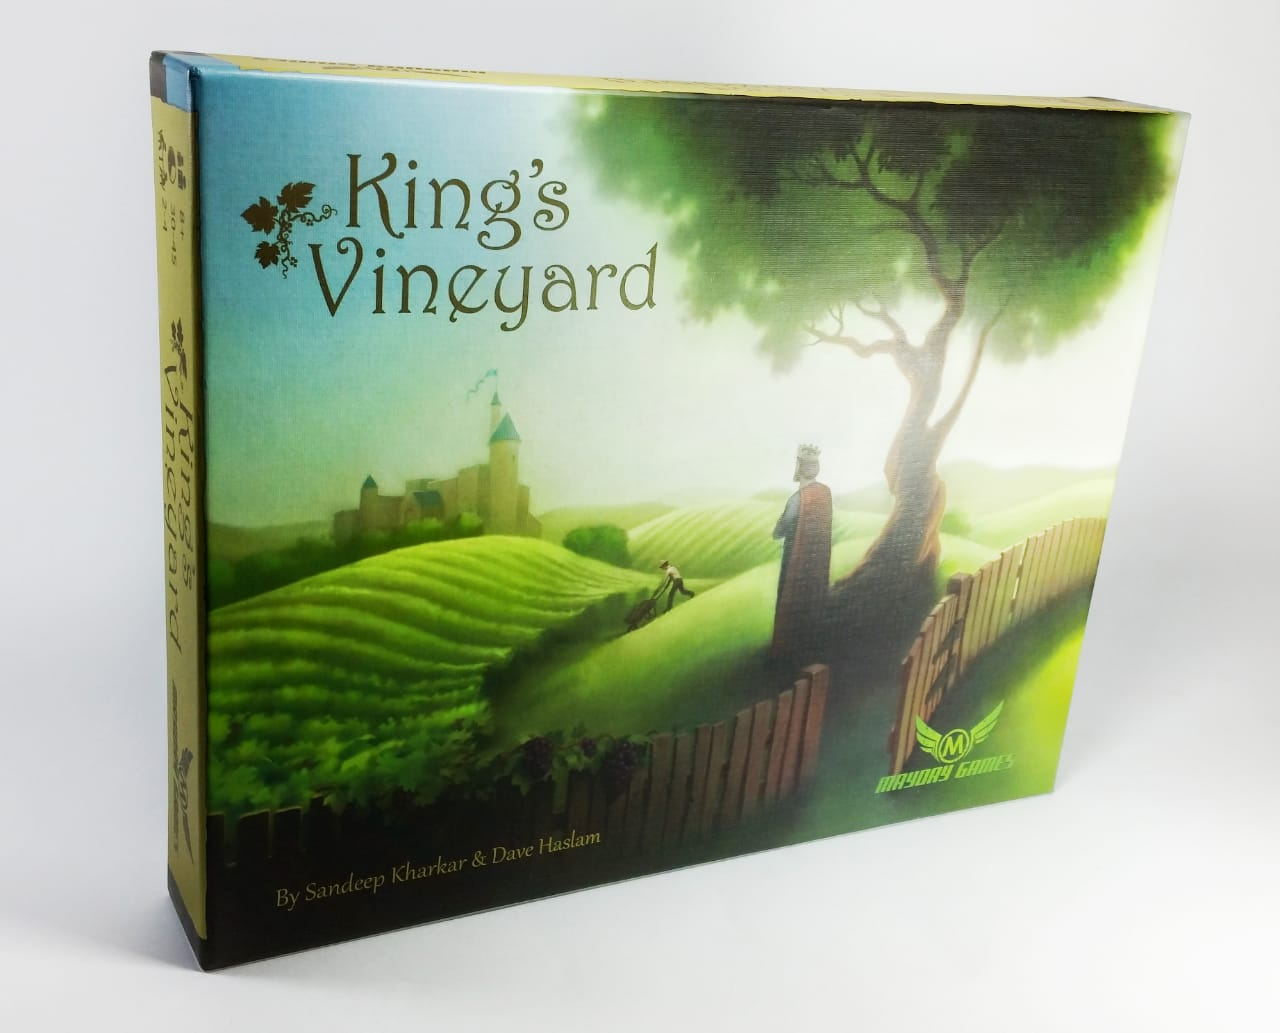 Kings Vineyard Jogo de Tabuleiro Importado Mayday Games  - Place Games